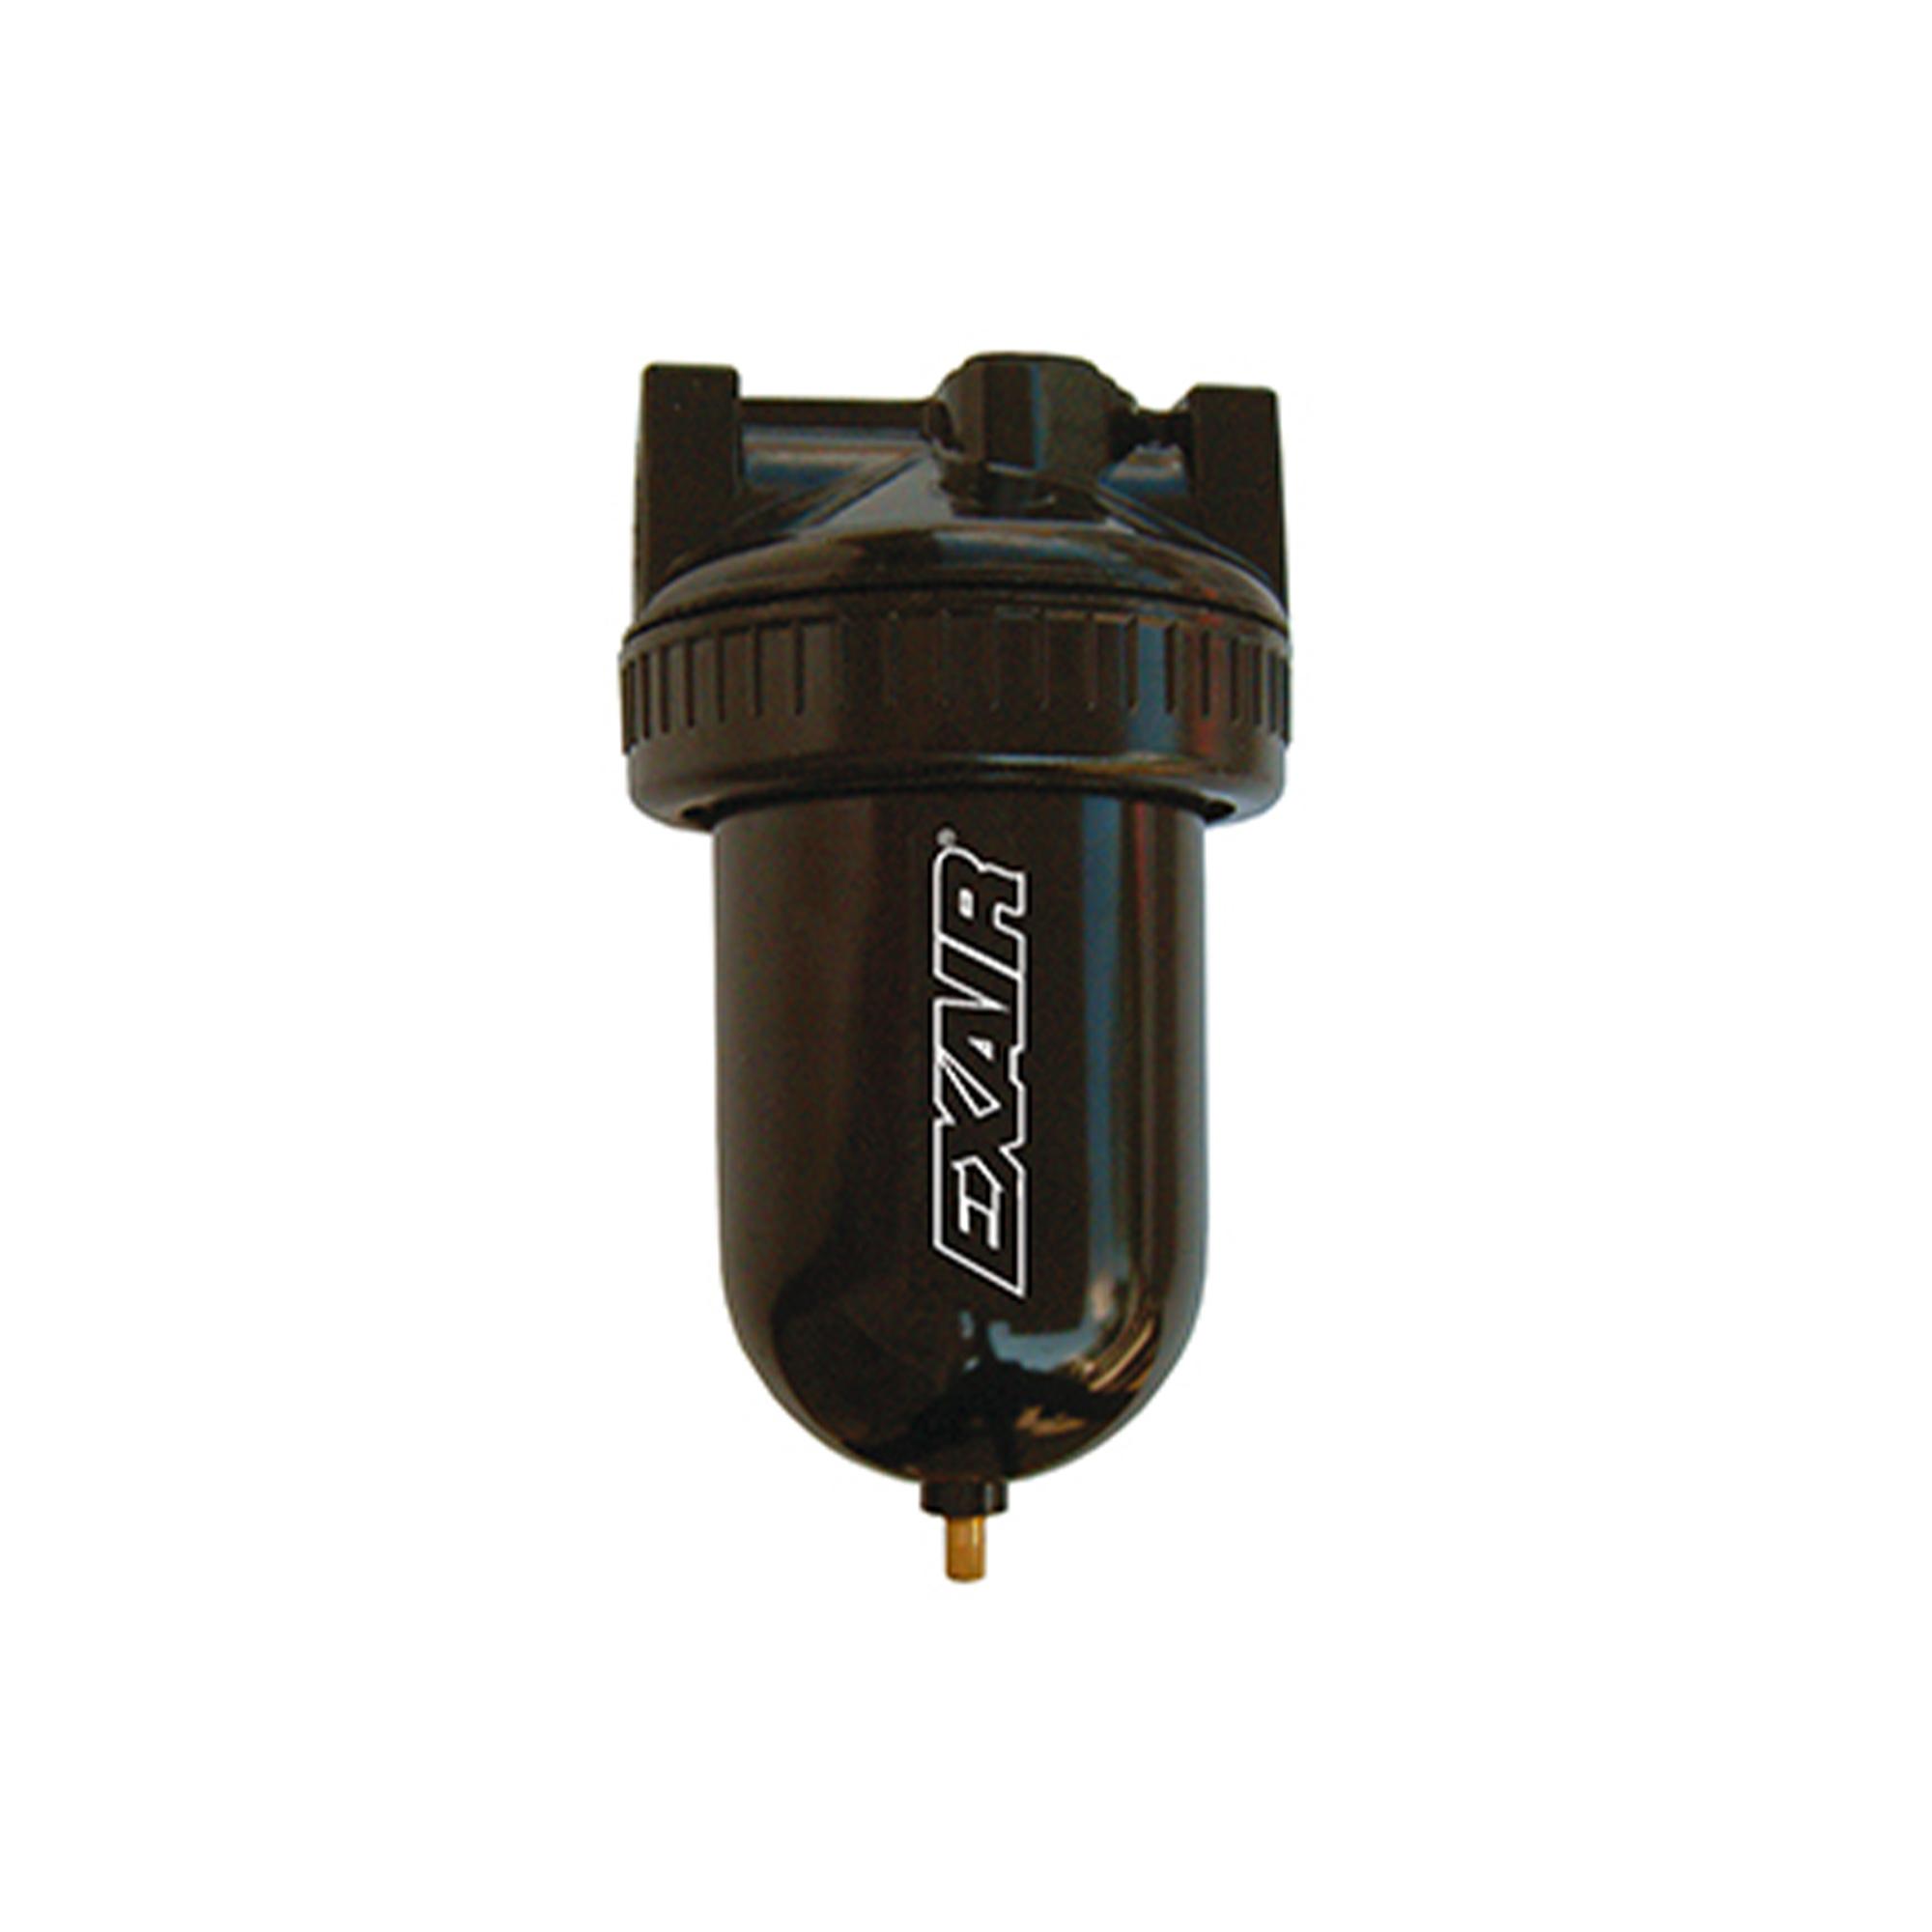 Model 9006 3/4 NPT Oil Removal Filter